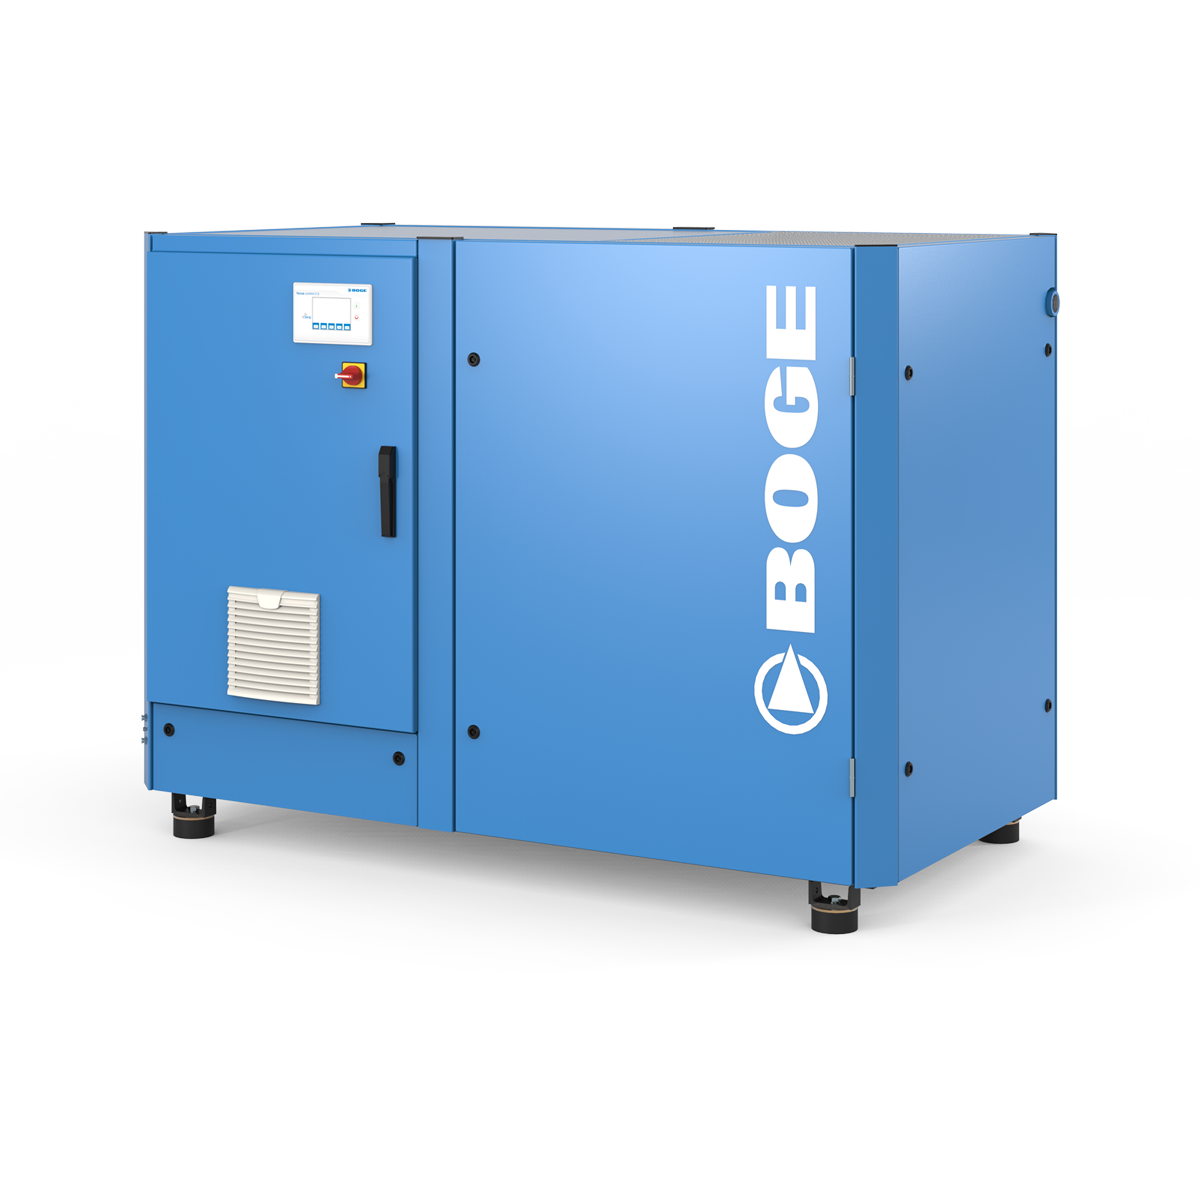 BOGE SLF51-3...SLF75-3 (37,0 kW...55,0 kW)